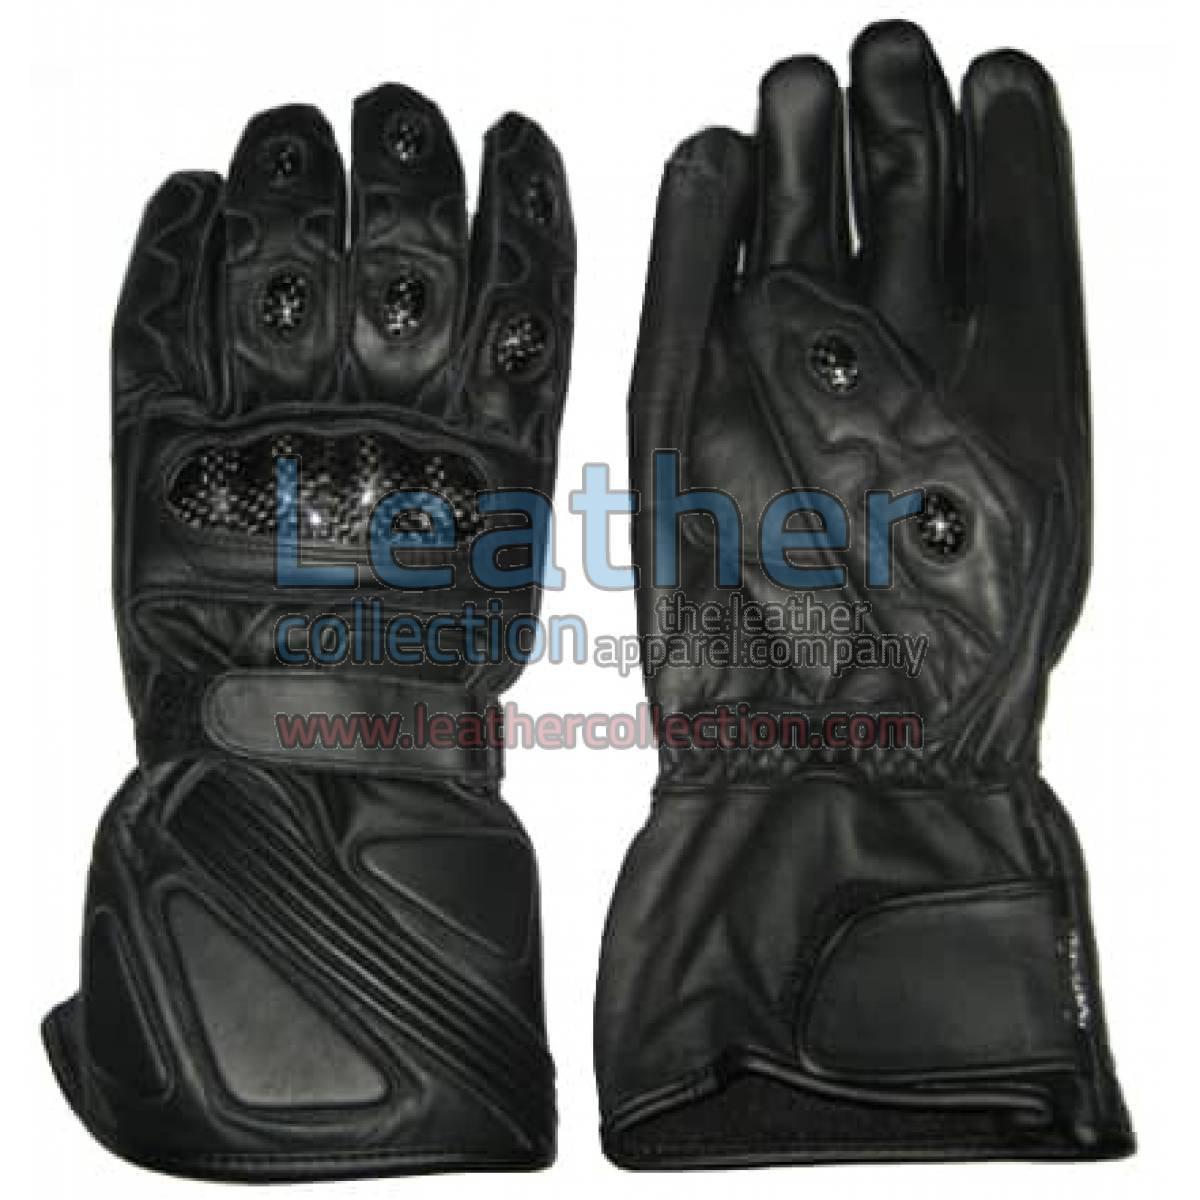 Bravo Black Leather Riding Gloves